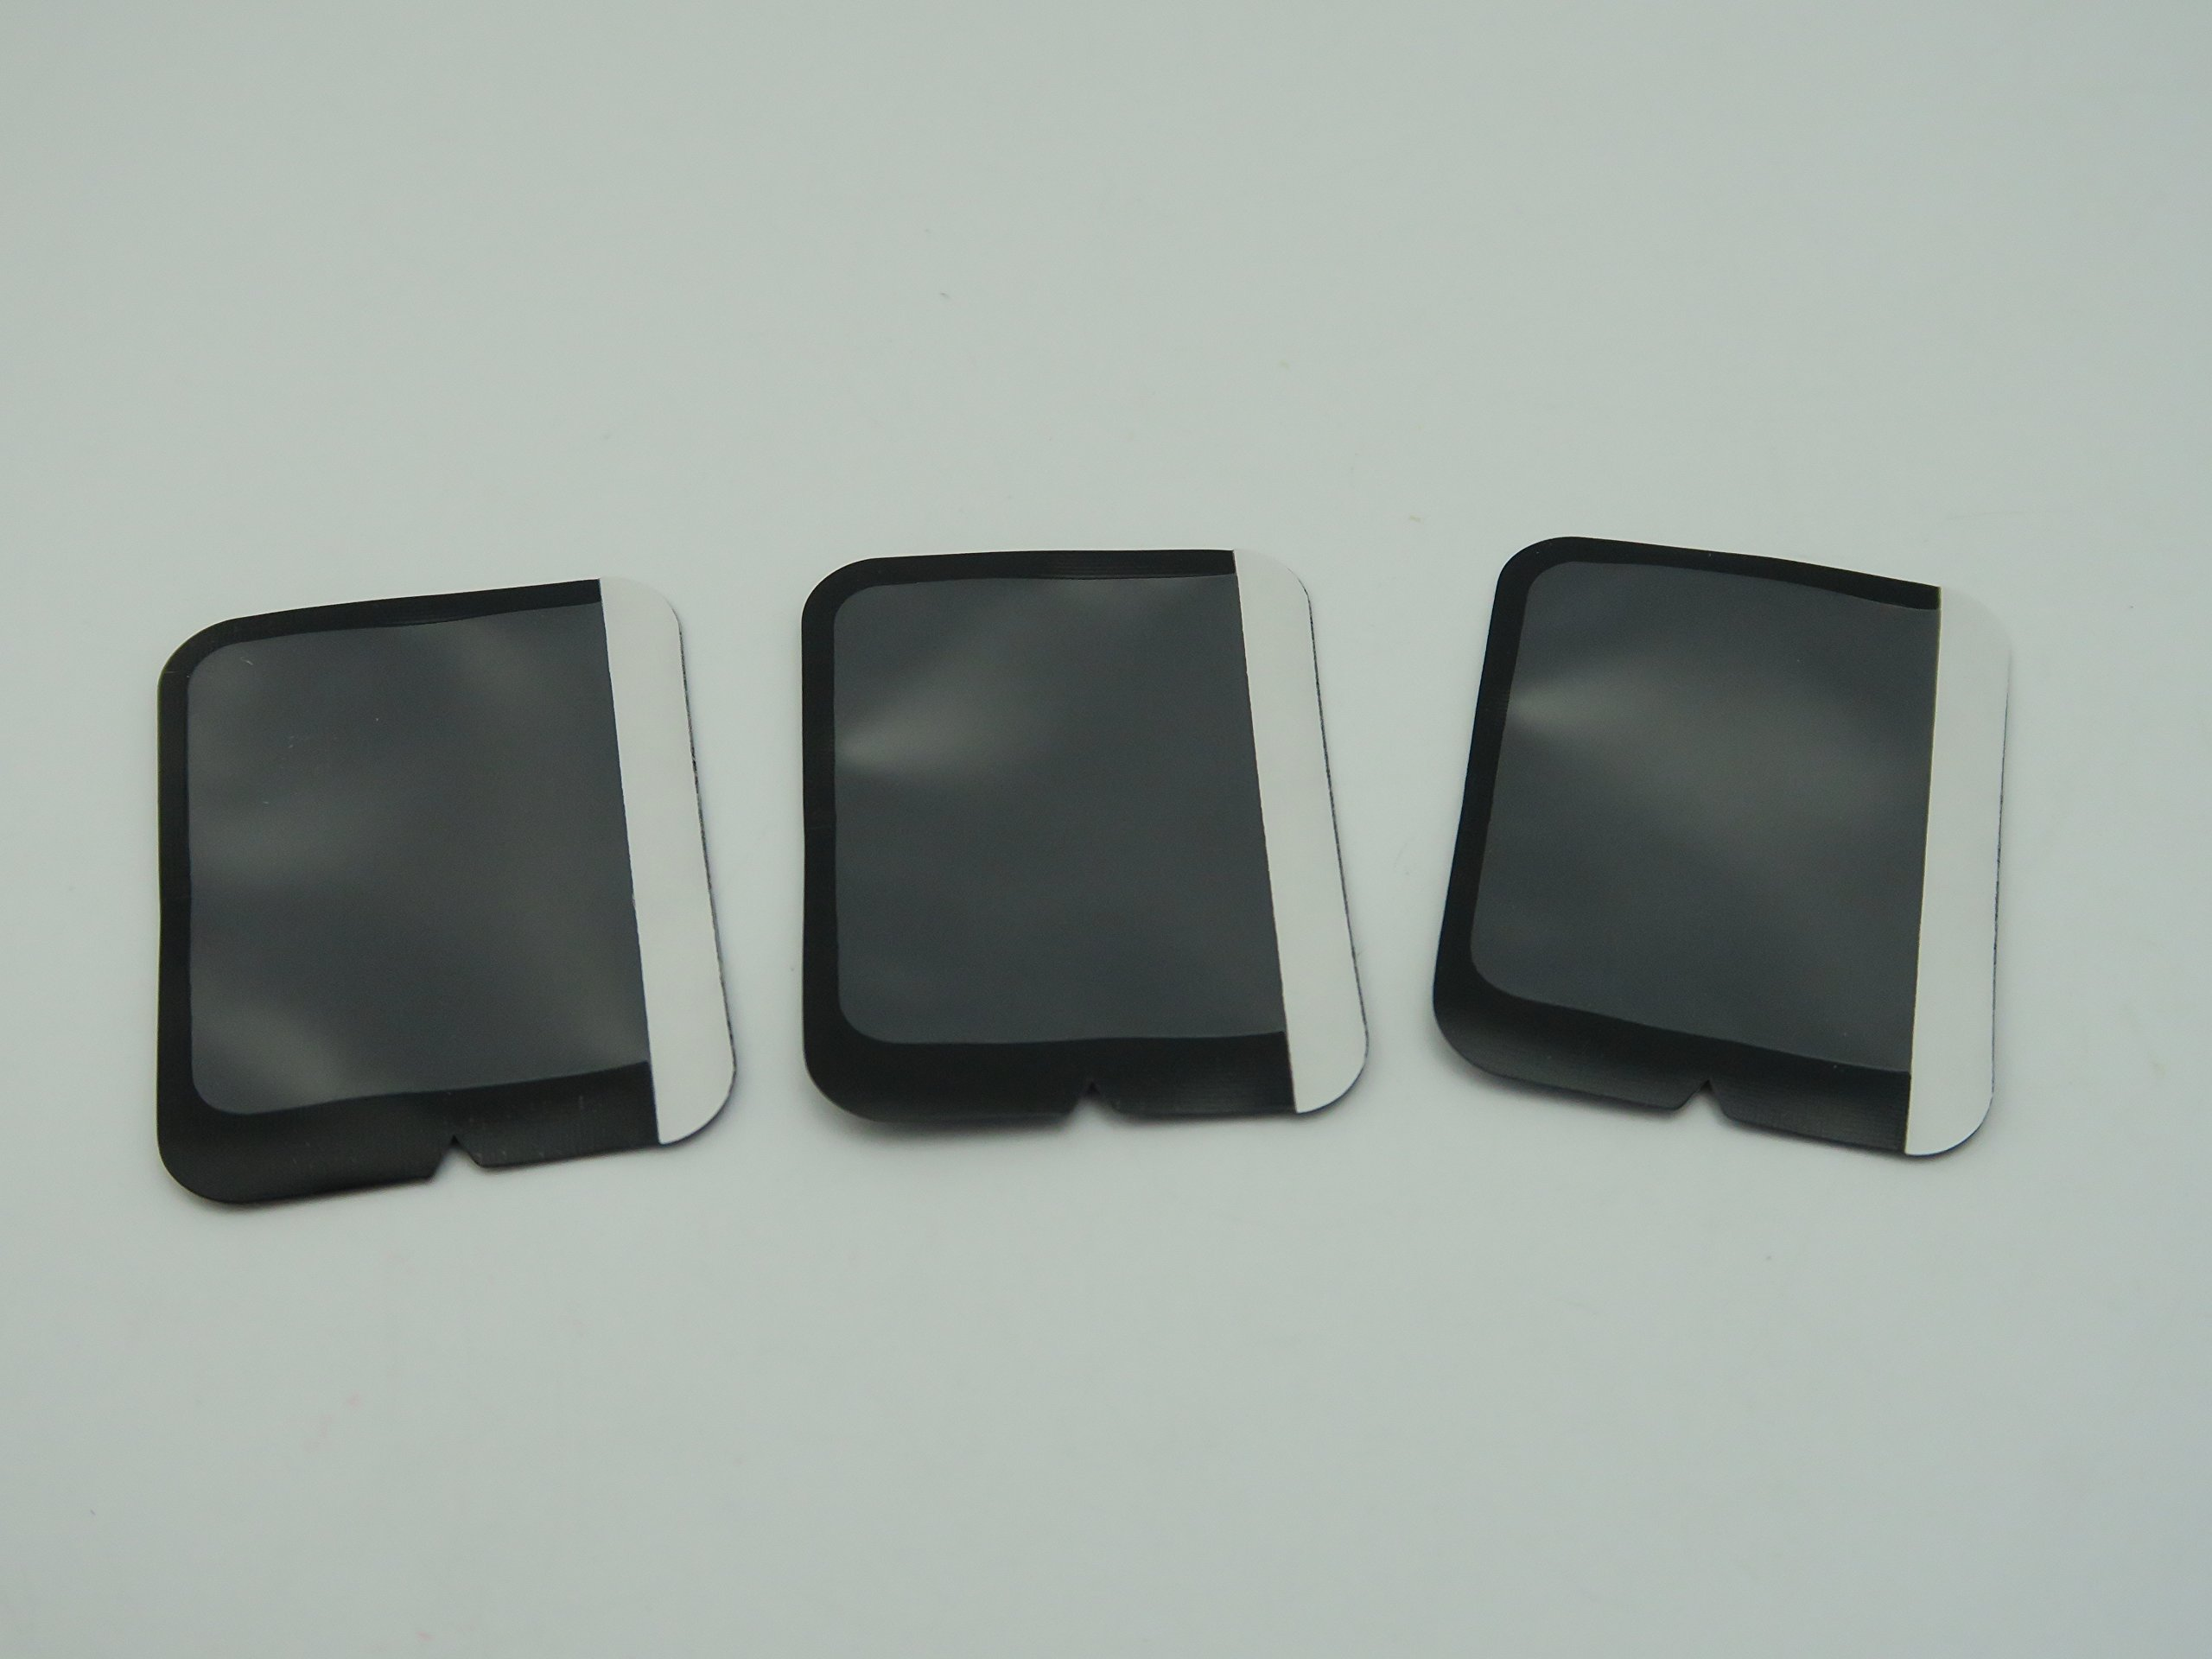 Fedex 2000pcs PE #2 Dental X-Ray Barrier Envelopes for Phosphor Plate by smiledt